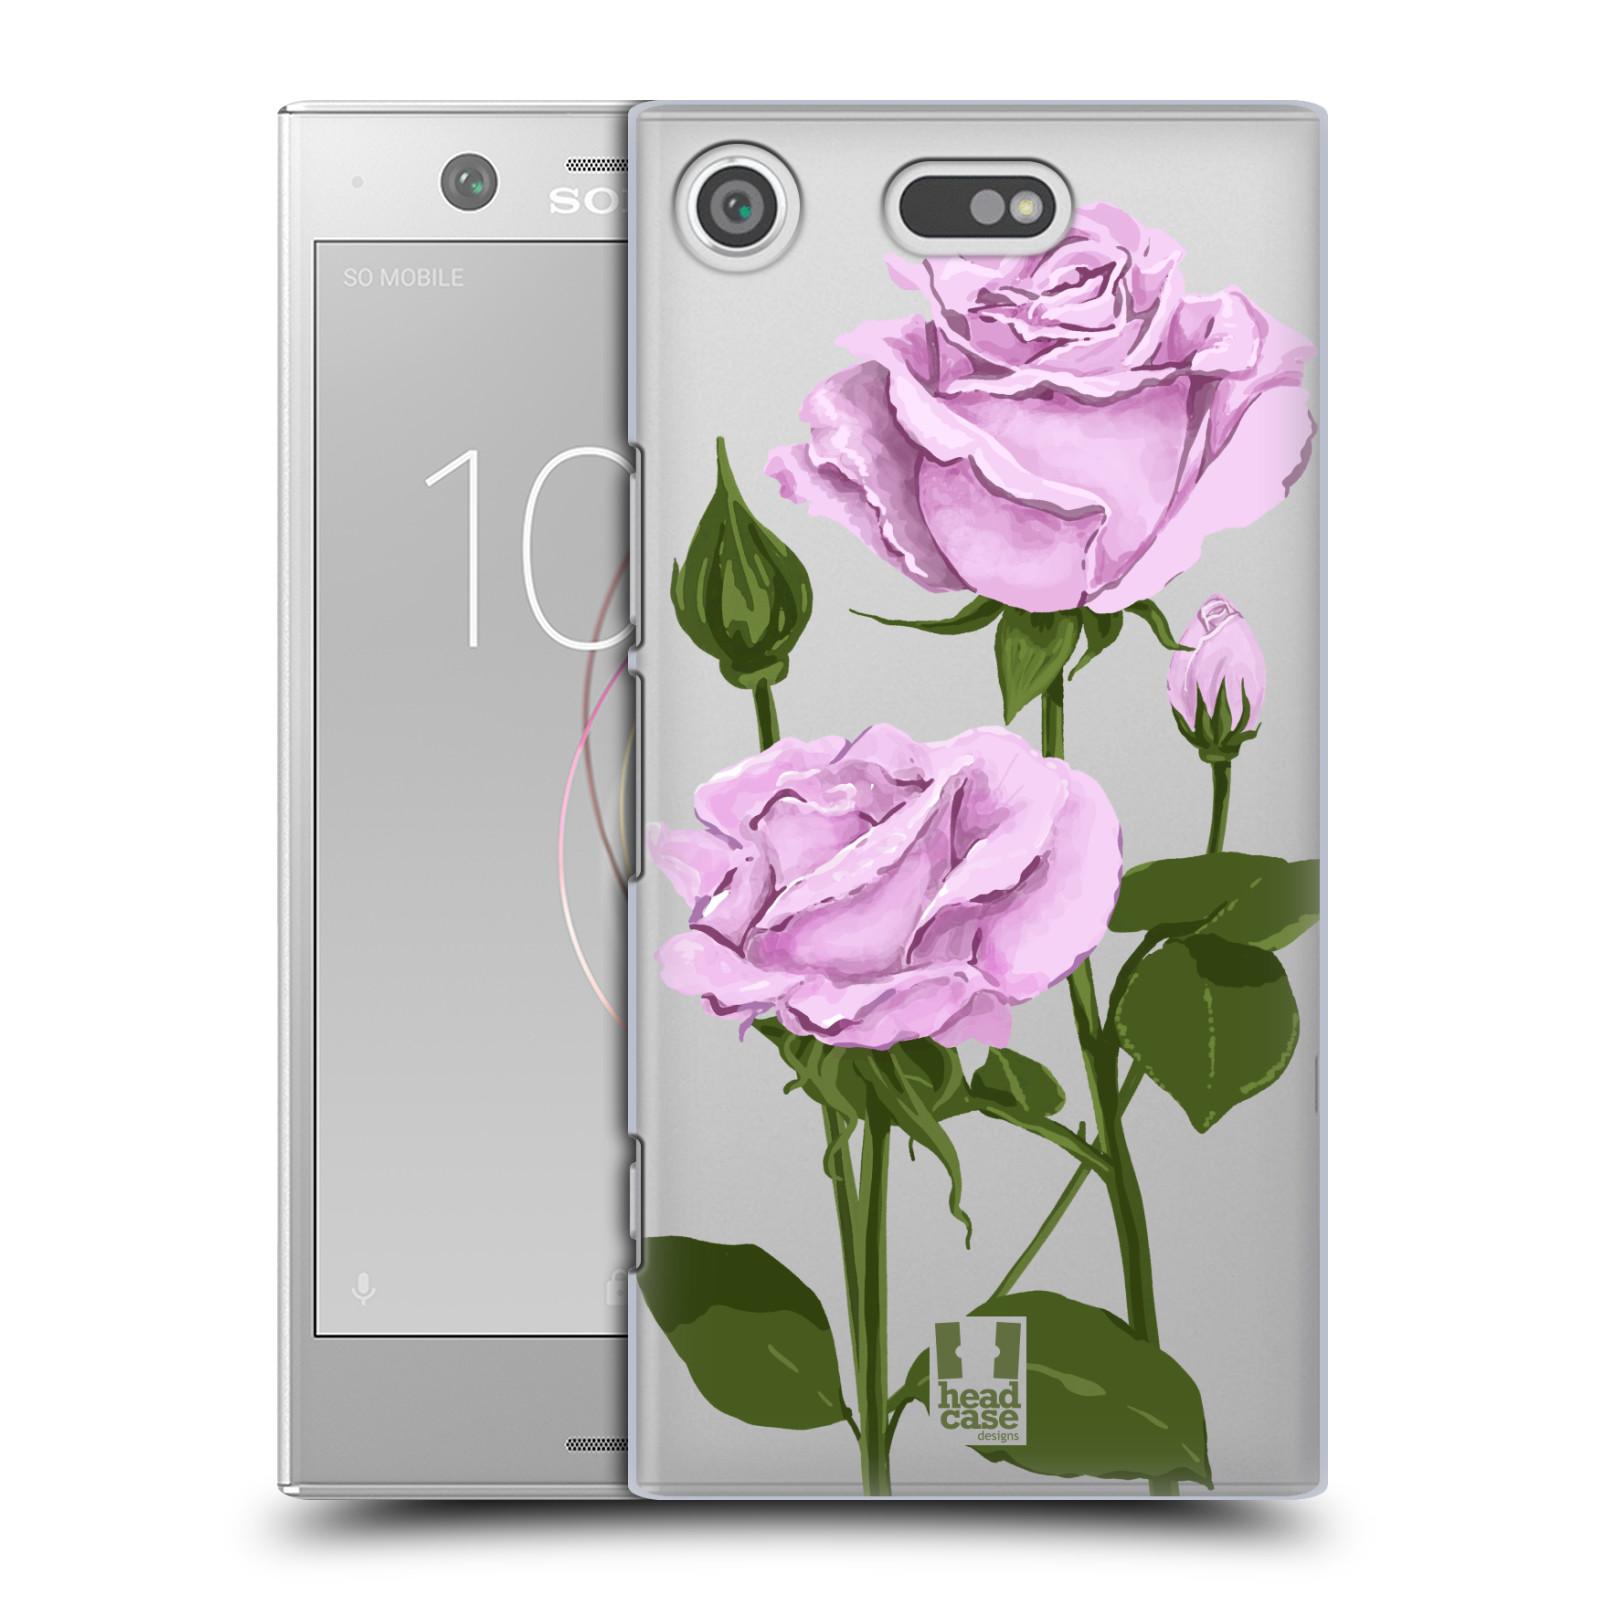 Pouzdro na mobil Sony Xperia XZ1 COMPACT - HEAD CASE - květina růže růžová